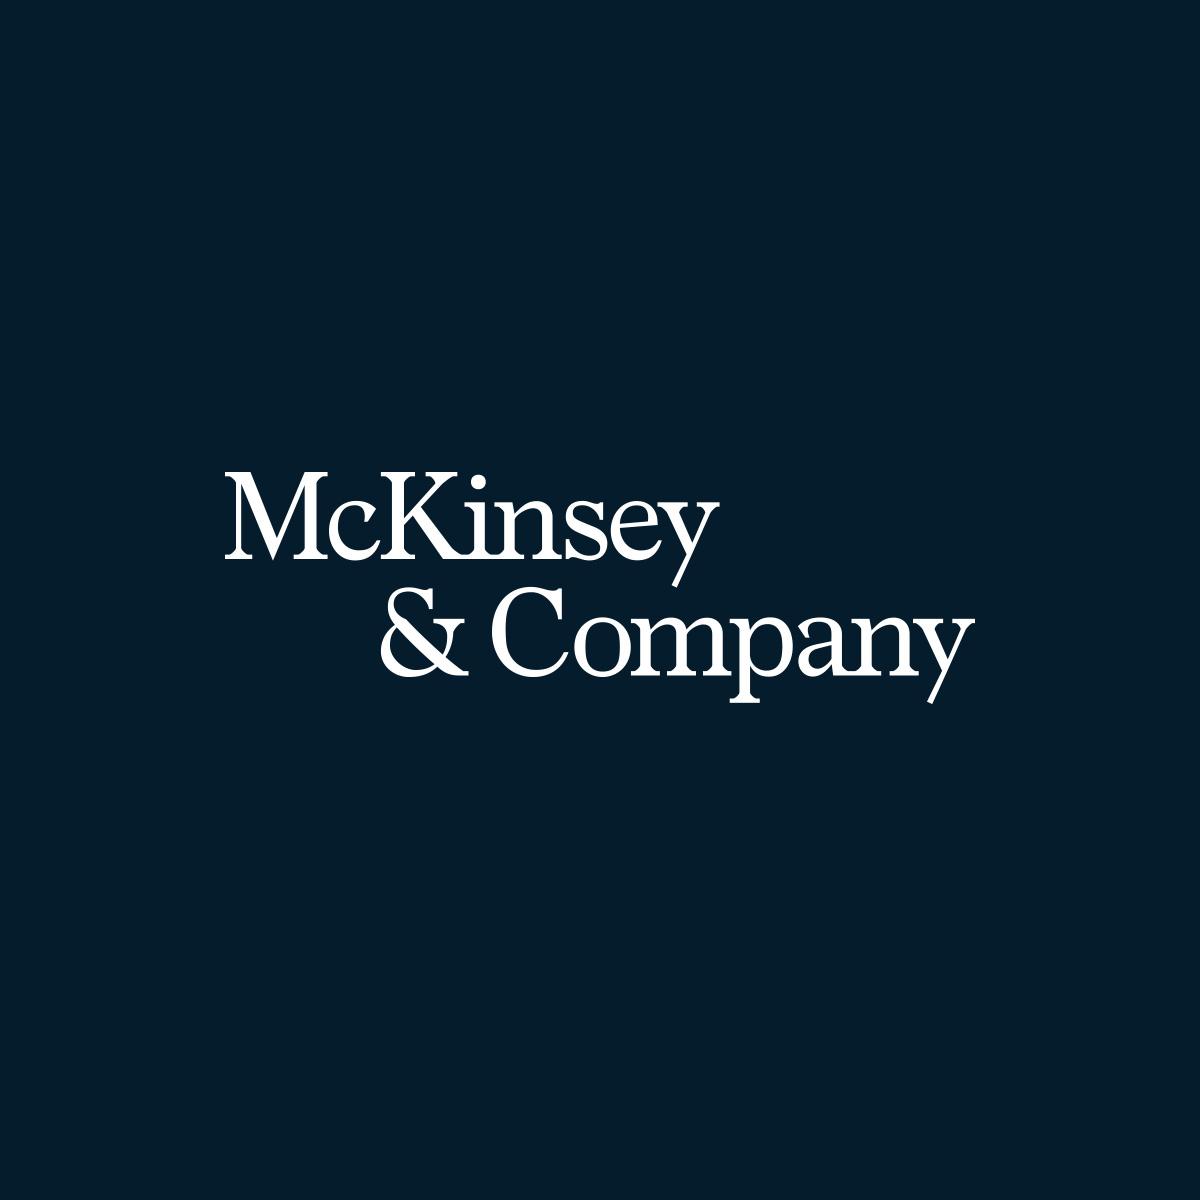 Business Analyst Intern   Careers   McKinsey & Company